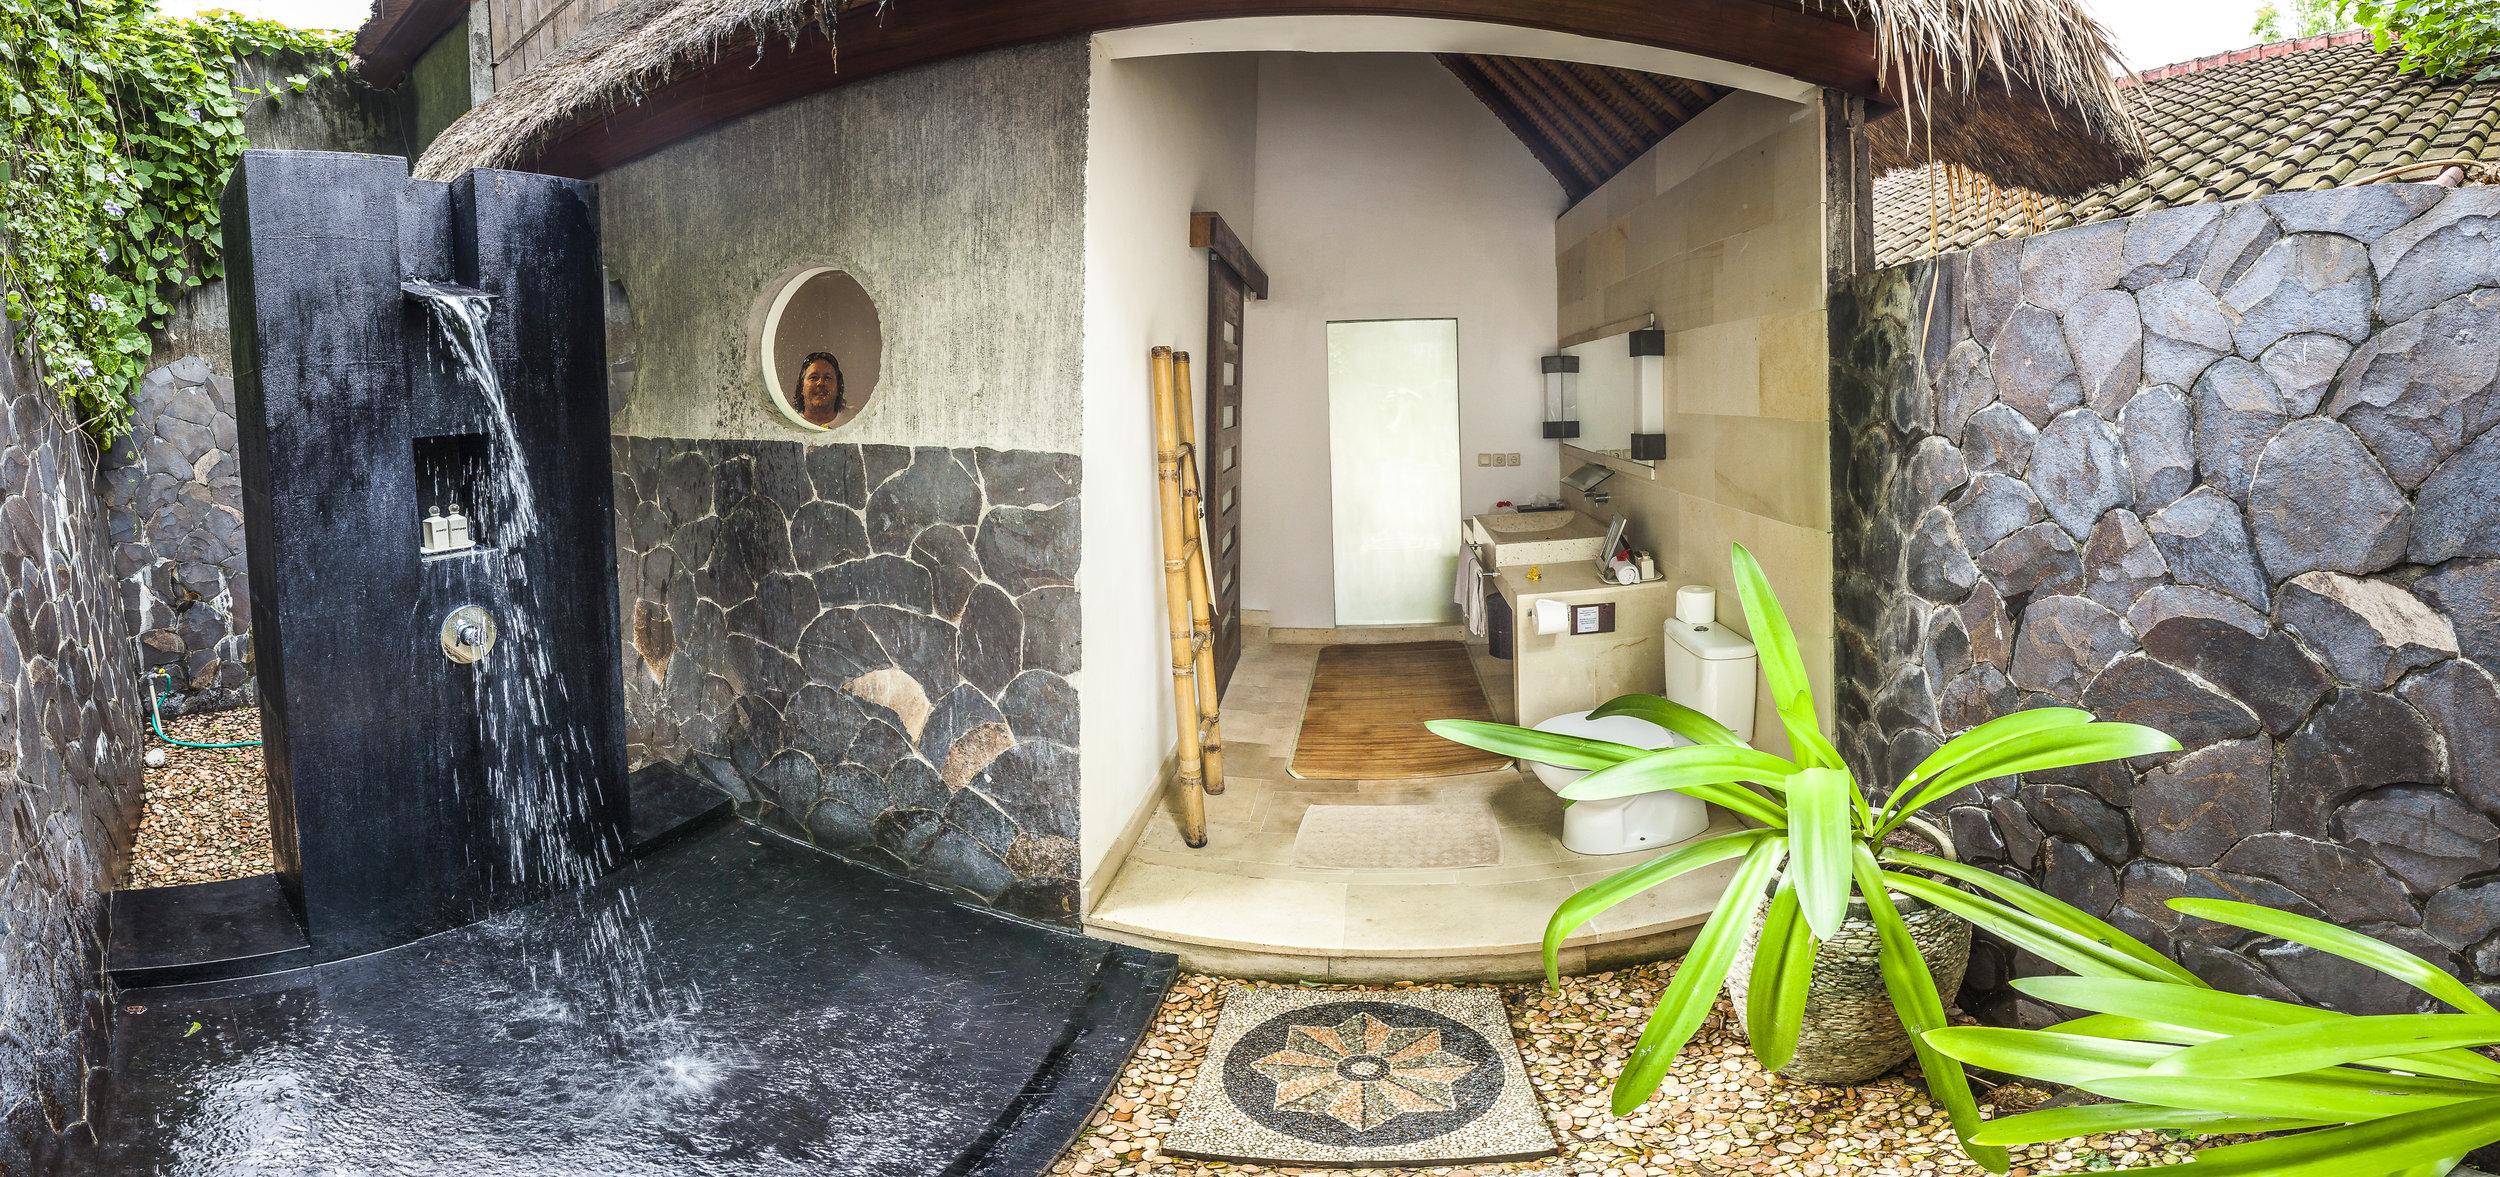 alamBatu_villa_anton_shower.jpg